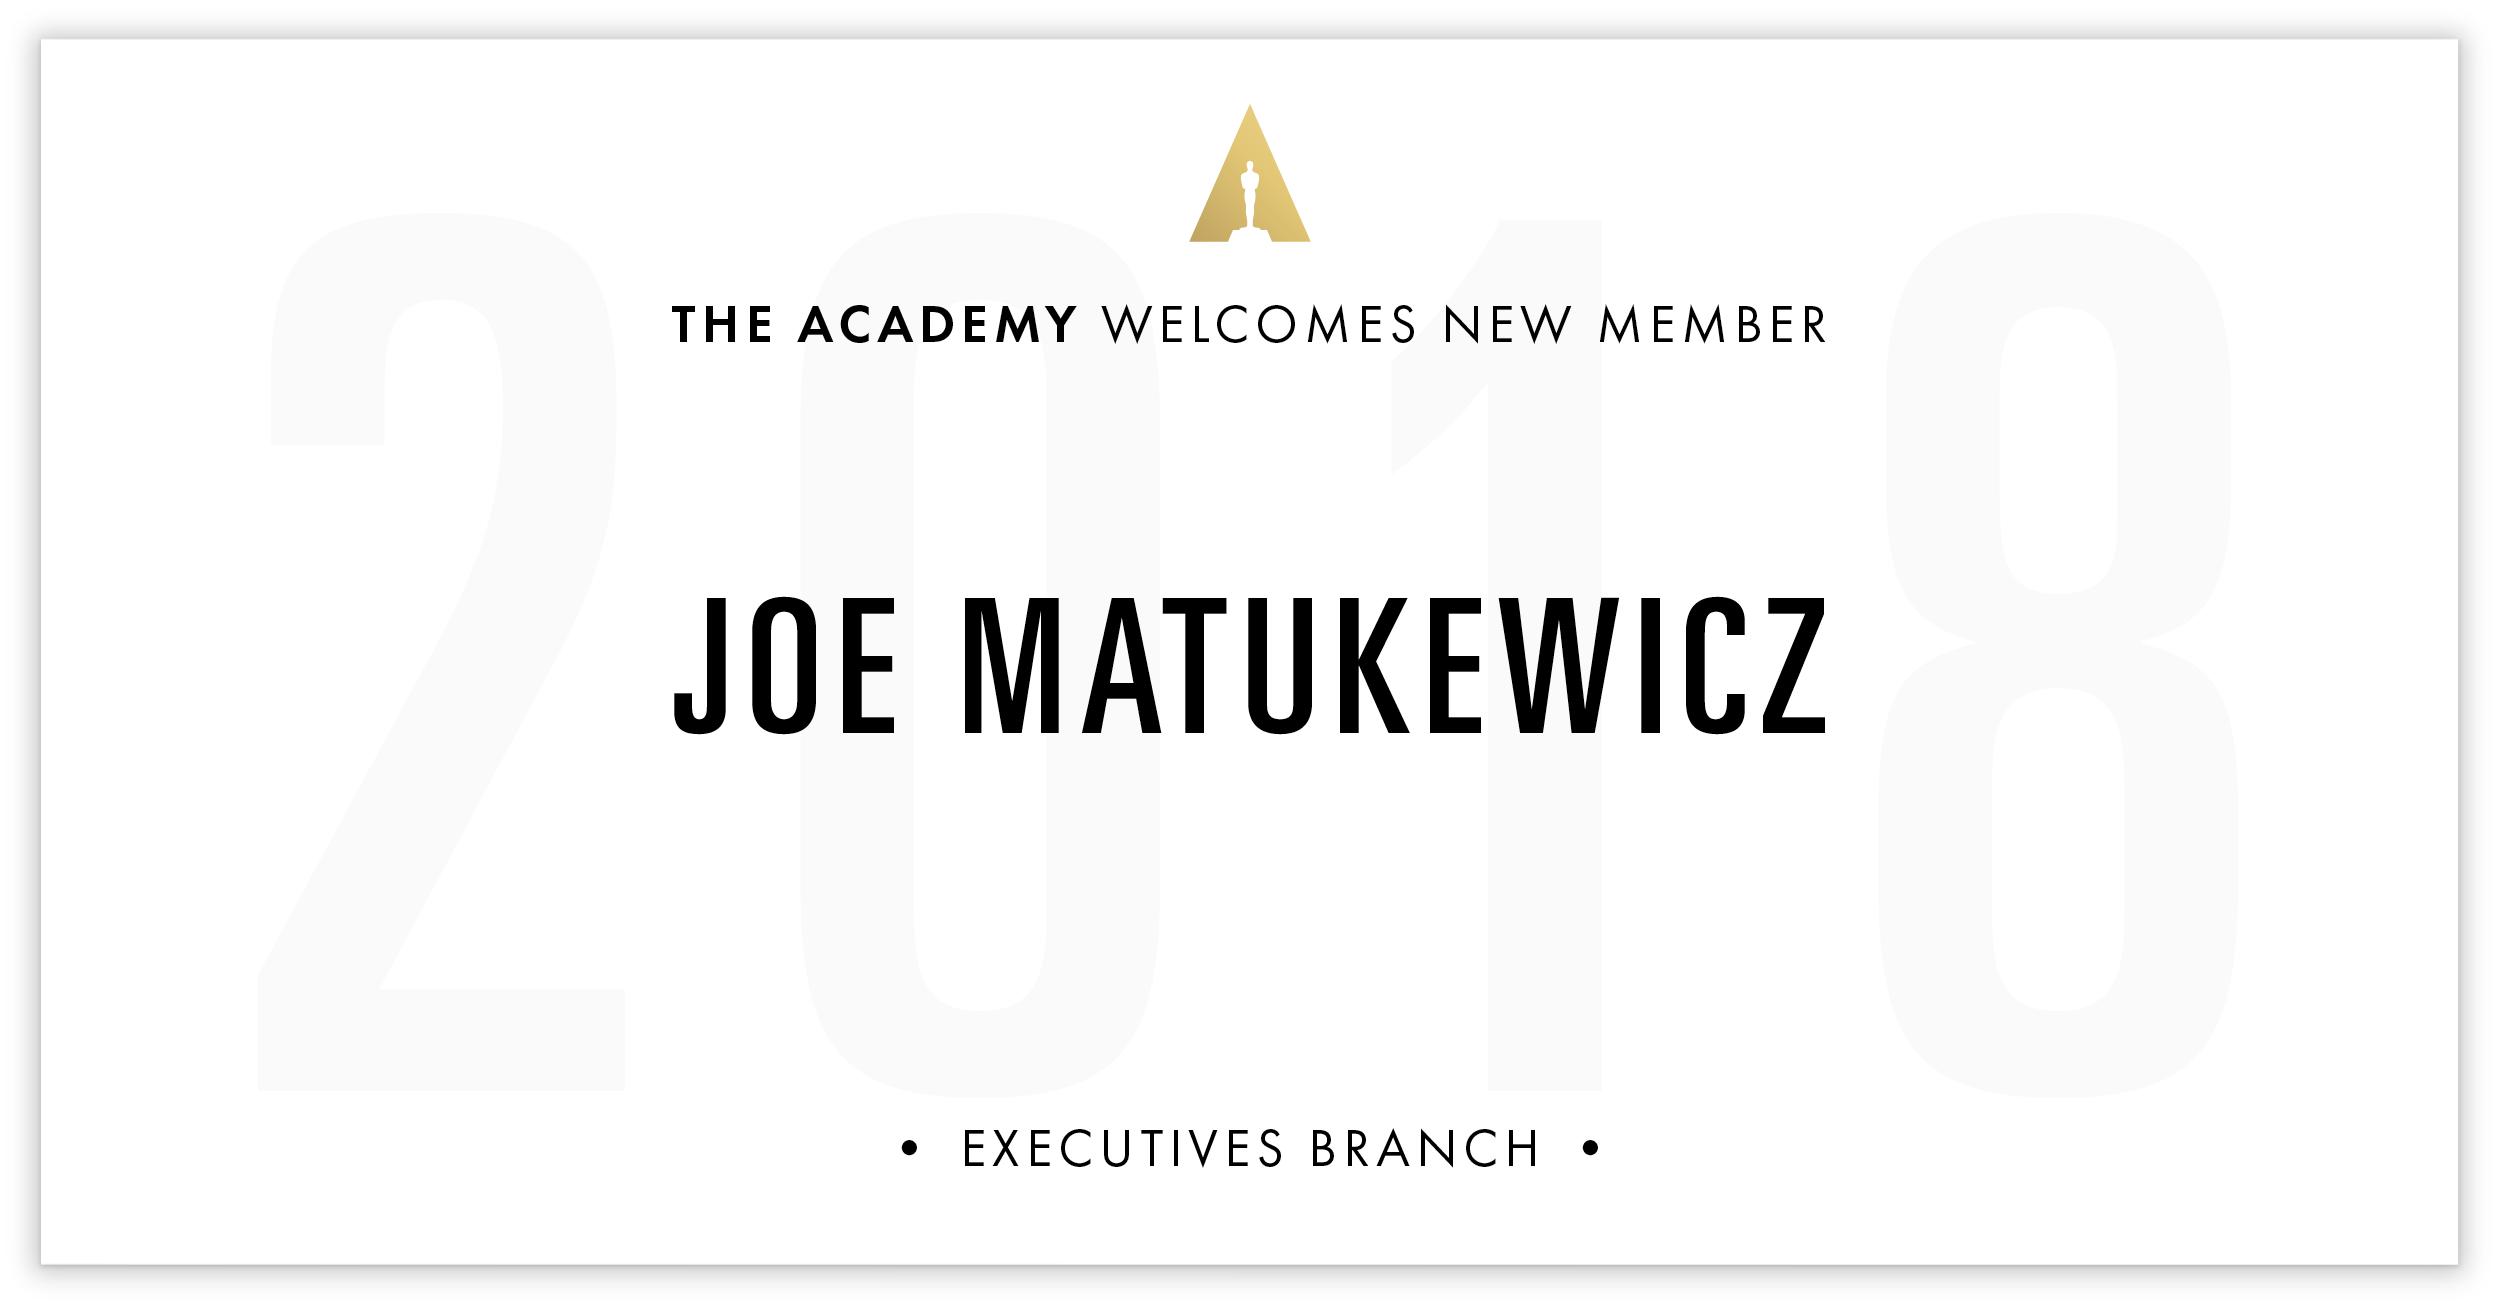 Joe Matukewicz is invited!